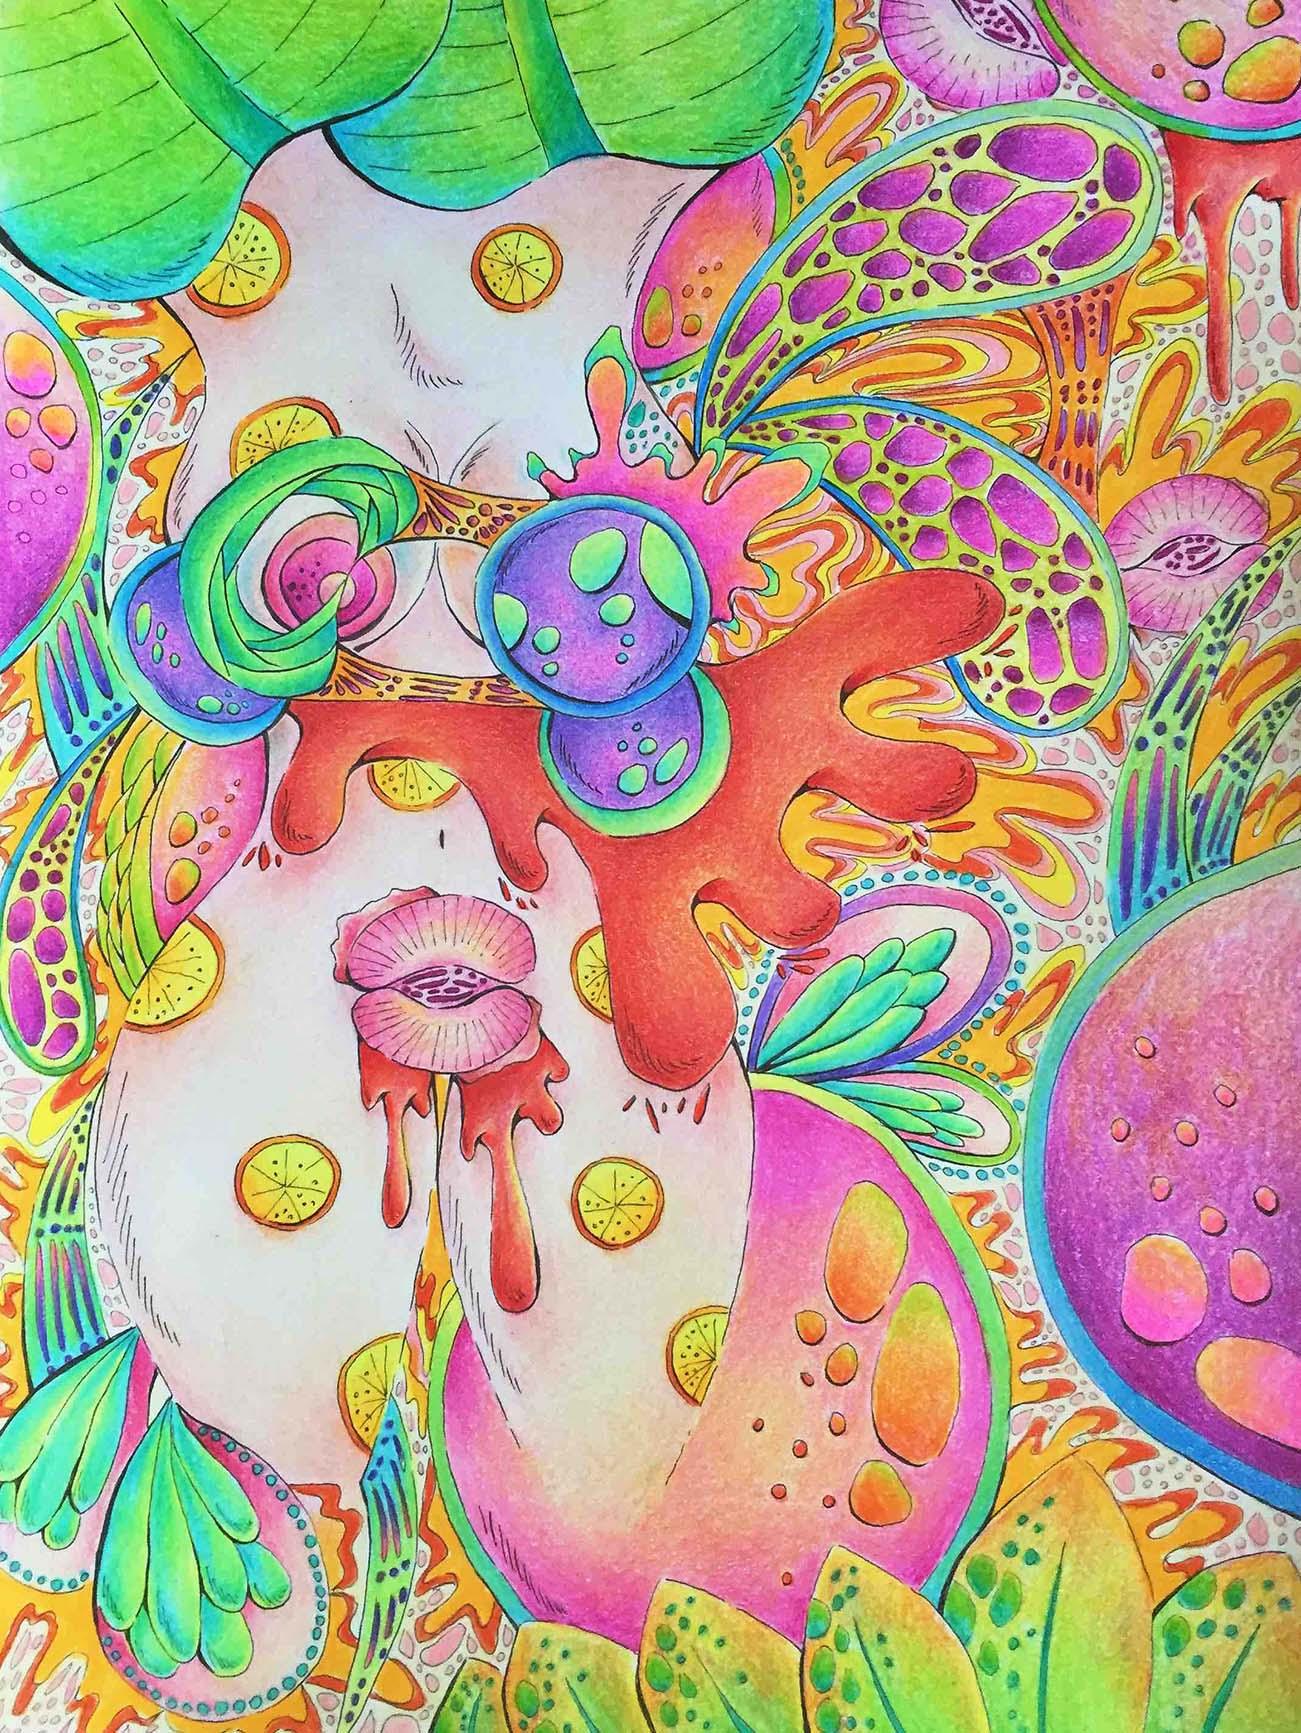 07 BKDIECI_Illustration02.jpg